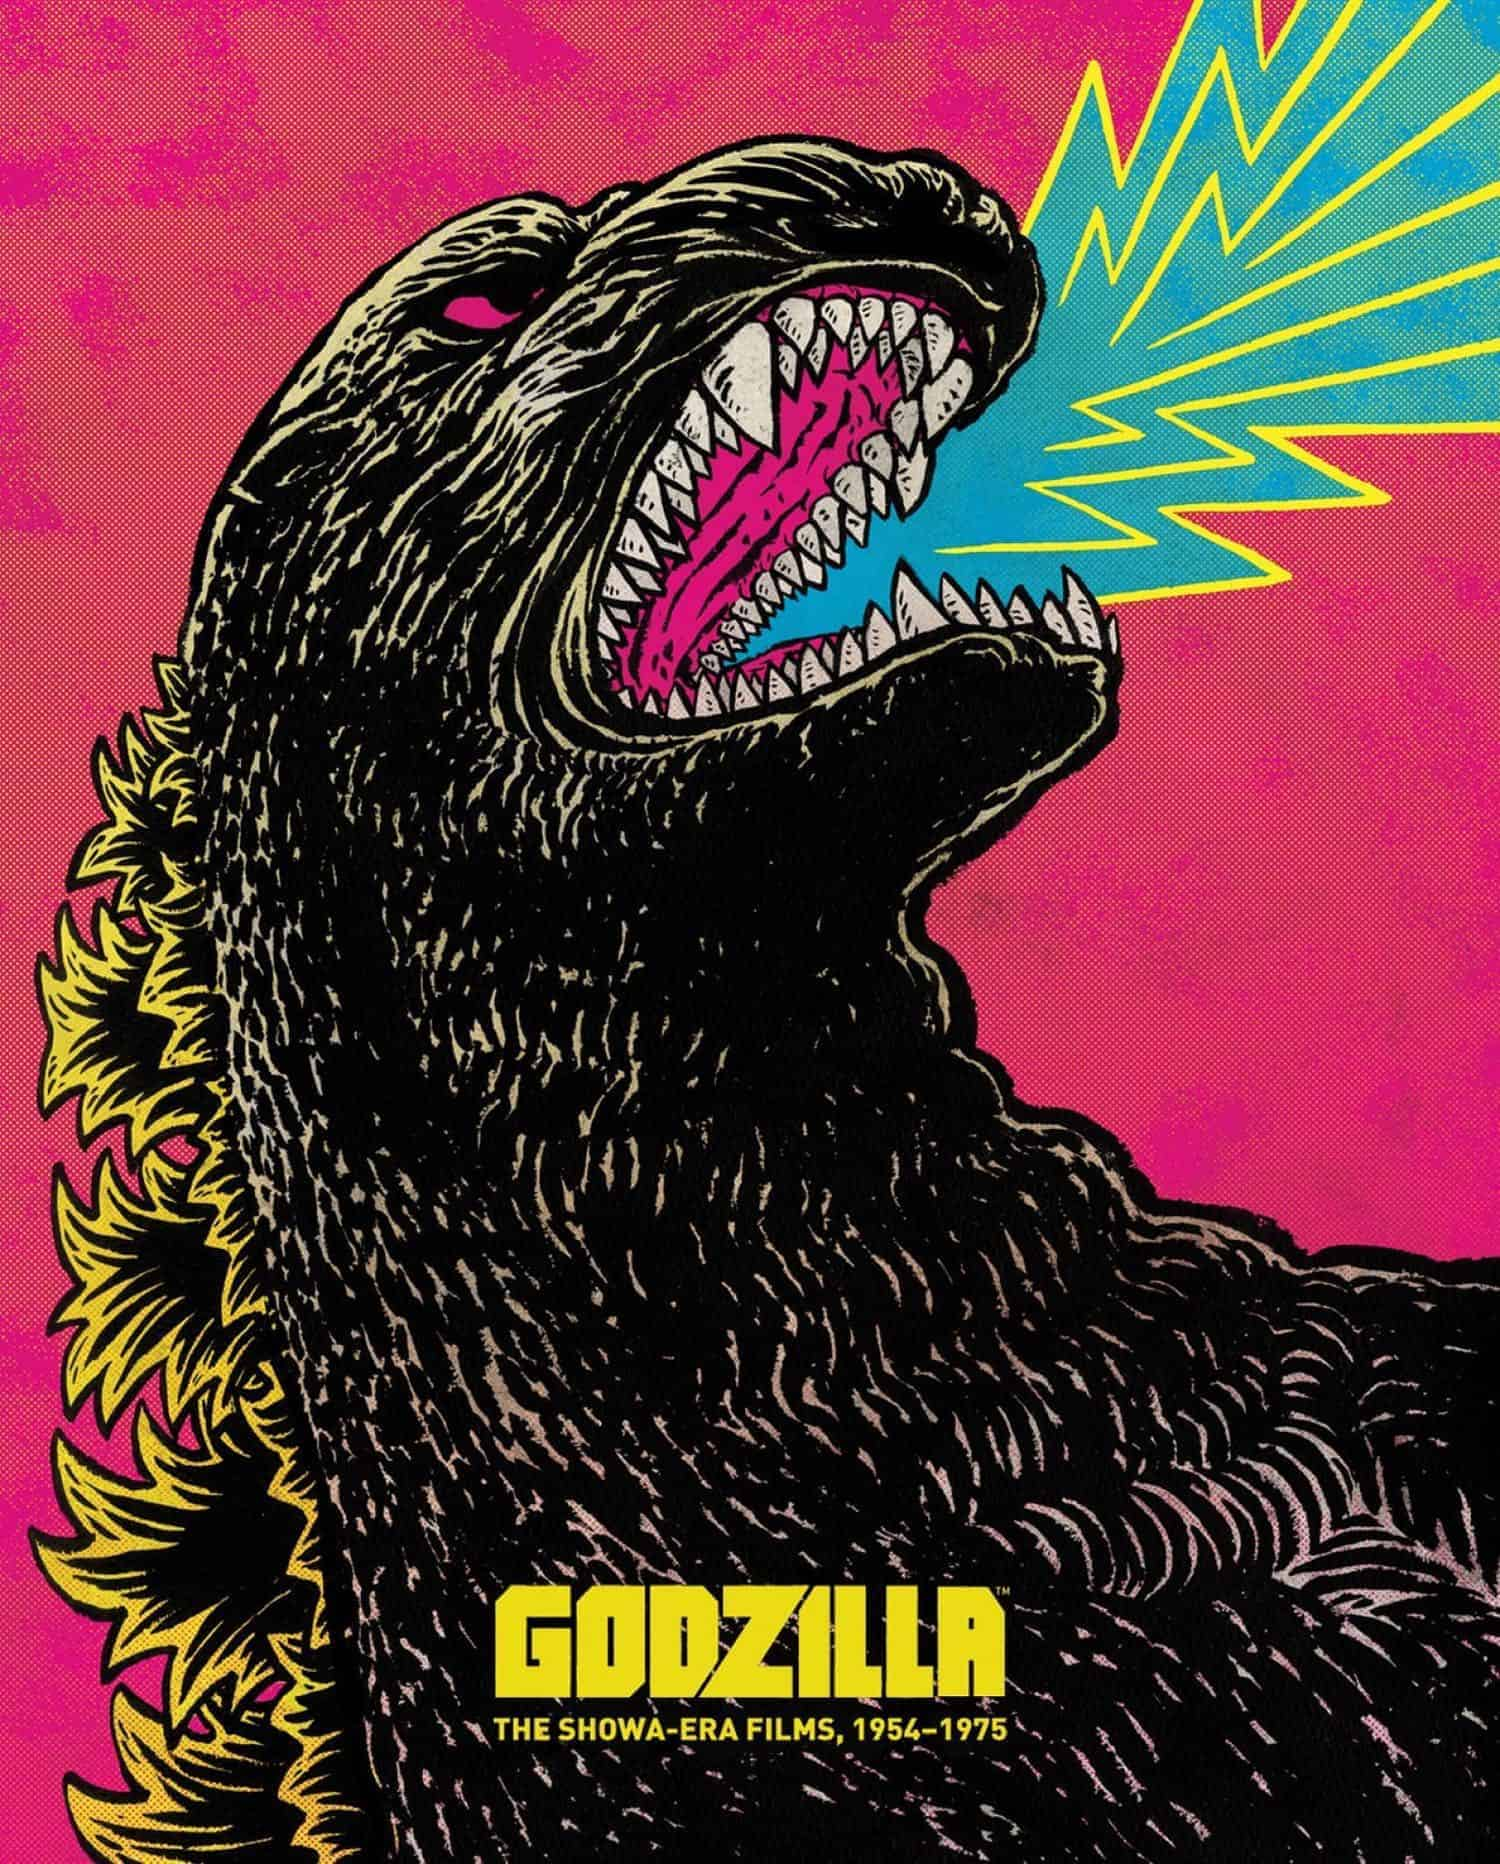 Godzilla The Showa Era Films 1954%E2%80%931975 Criterion Bluray